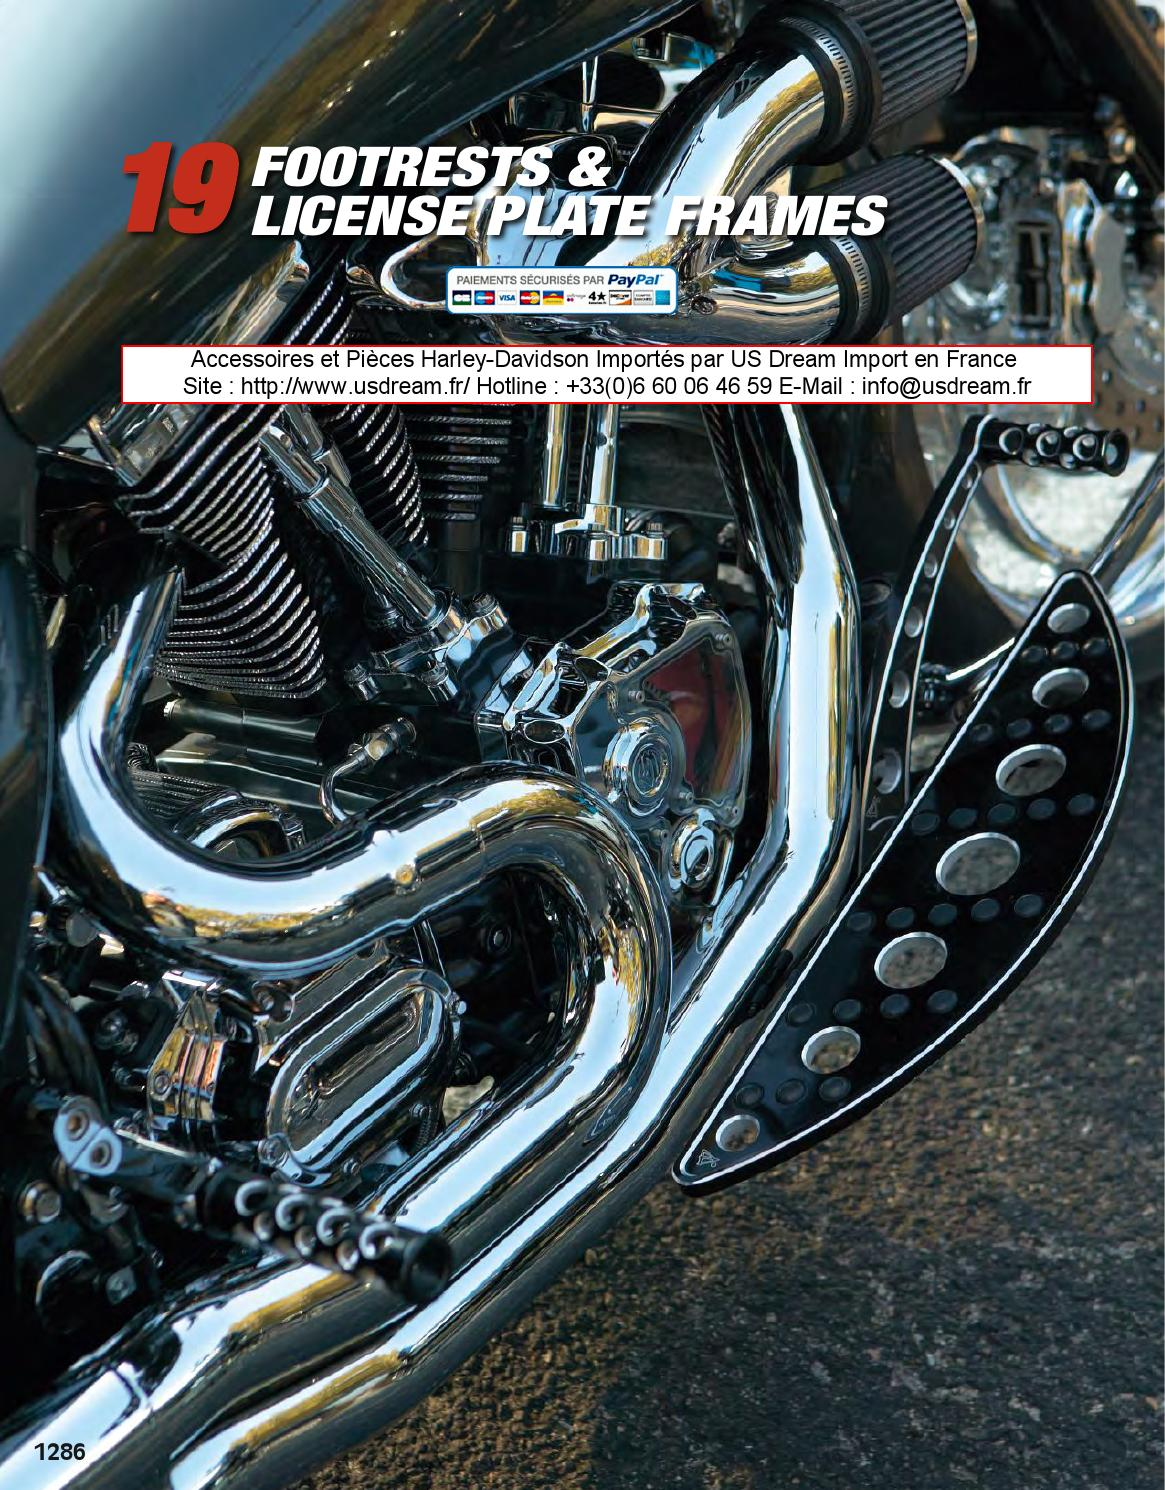 Accessoire Harley Davidson Piece Moto Custom Marche Pied Us Import 2014 Xl1200v Wiring Diagram By Pieces Chrome Et Accessoires Des Usa Issuu